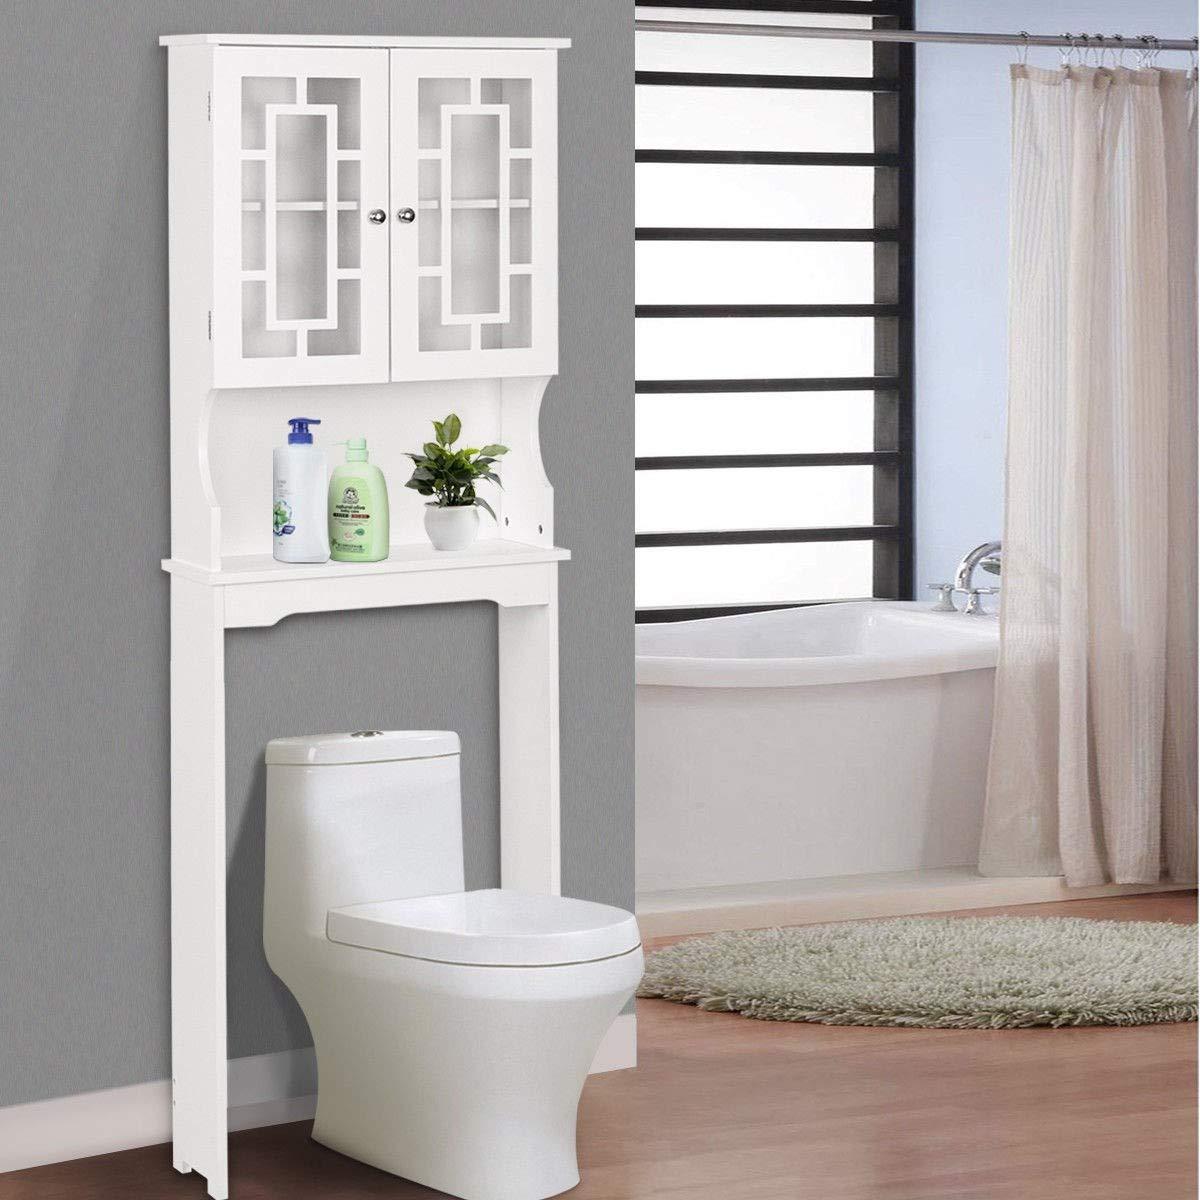 BestComfort Wooden Over The Toilet Cabinet Storage, BathroomOrganizerOverToiletStorage, Above The Toilet Space Saver Cabinet (23.5''x 9''x 67''(L x Wx H)) by BestComfort